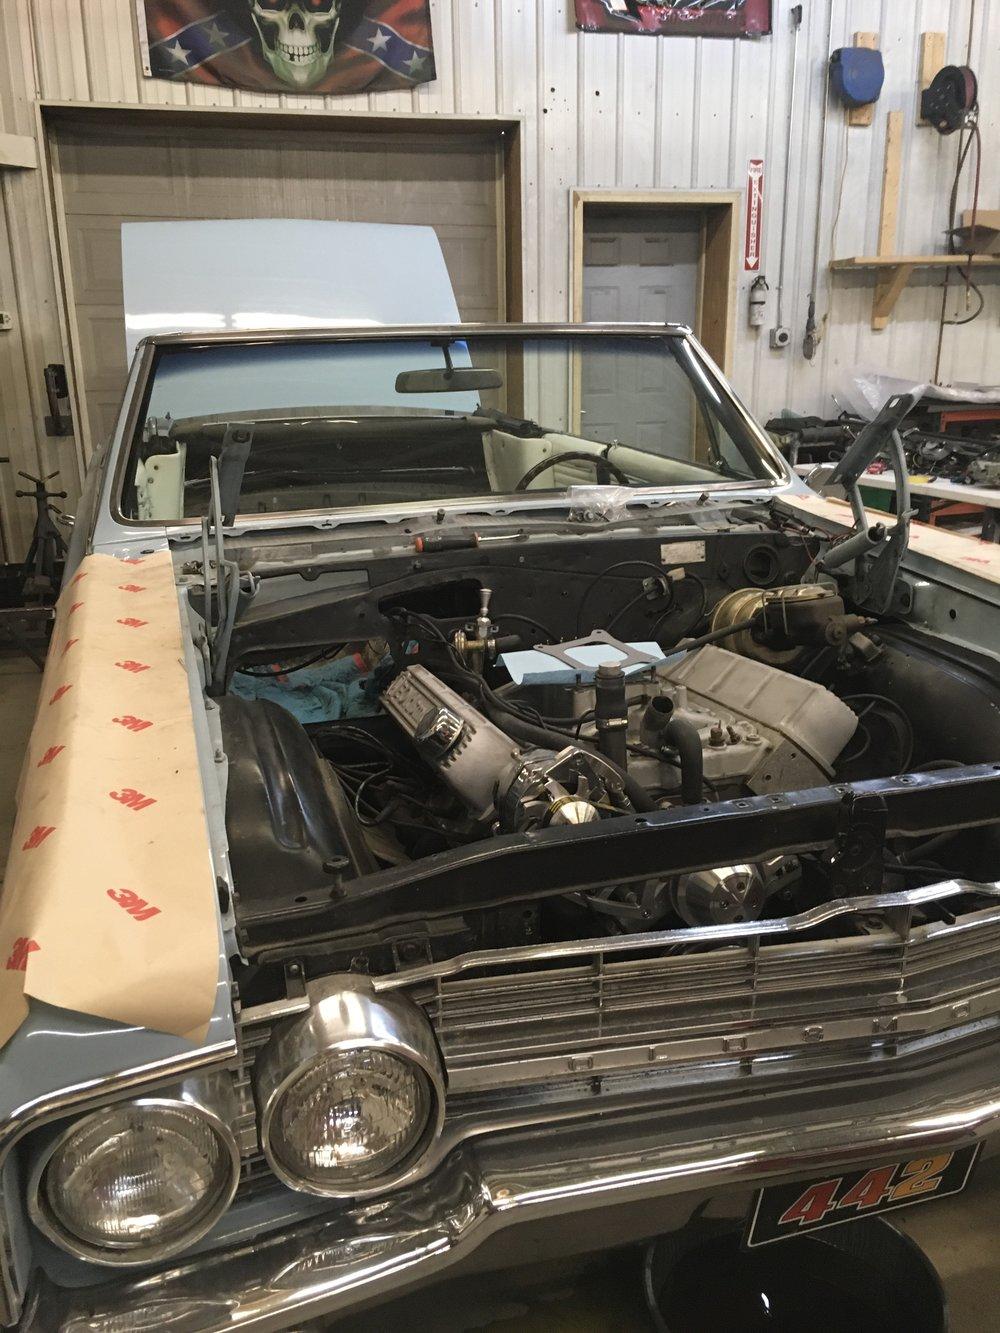 1965-442-minnesota-muscle-car-restoration-engine-hot-rod-factory.jpg